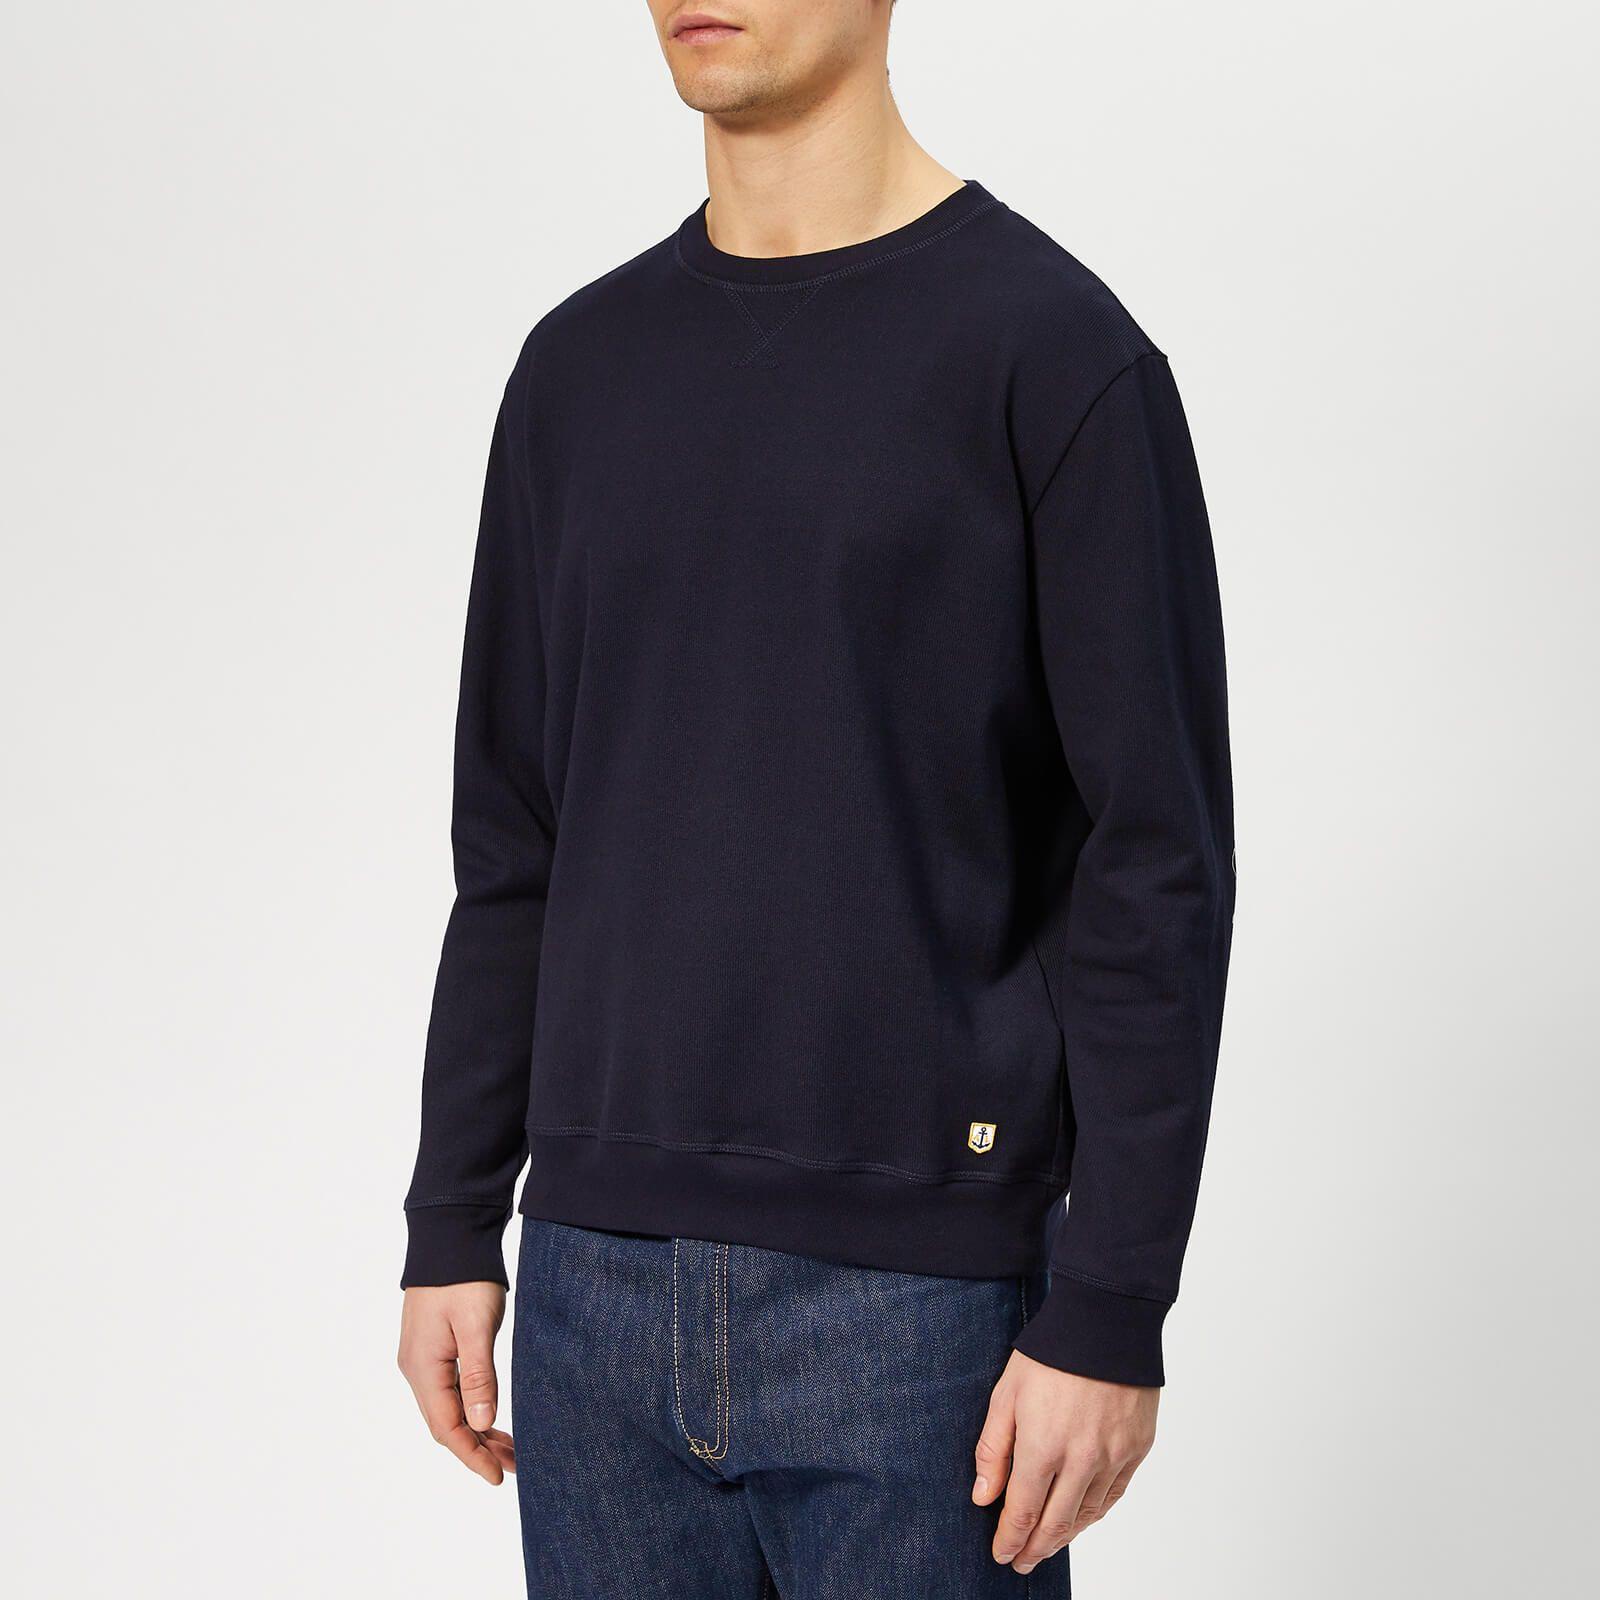 Armor Lux Mens Sweatshirt